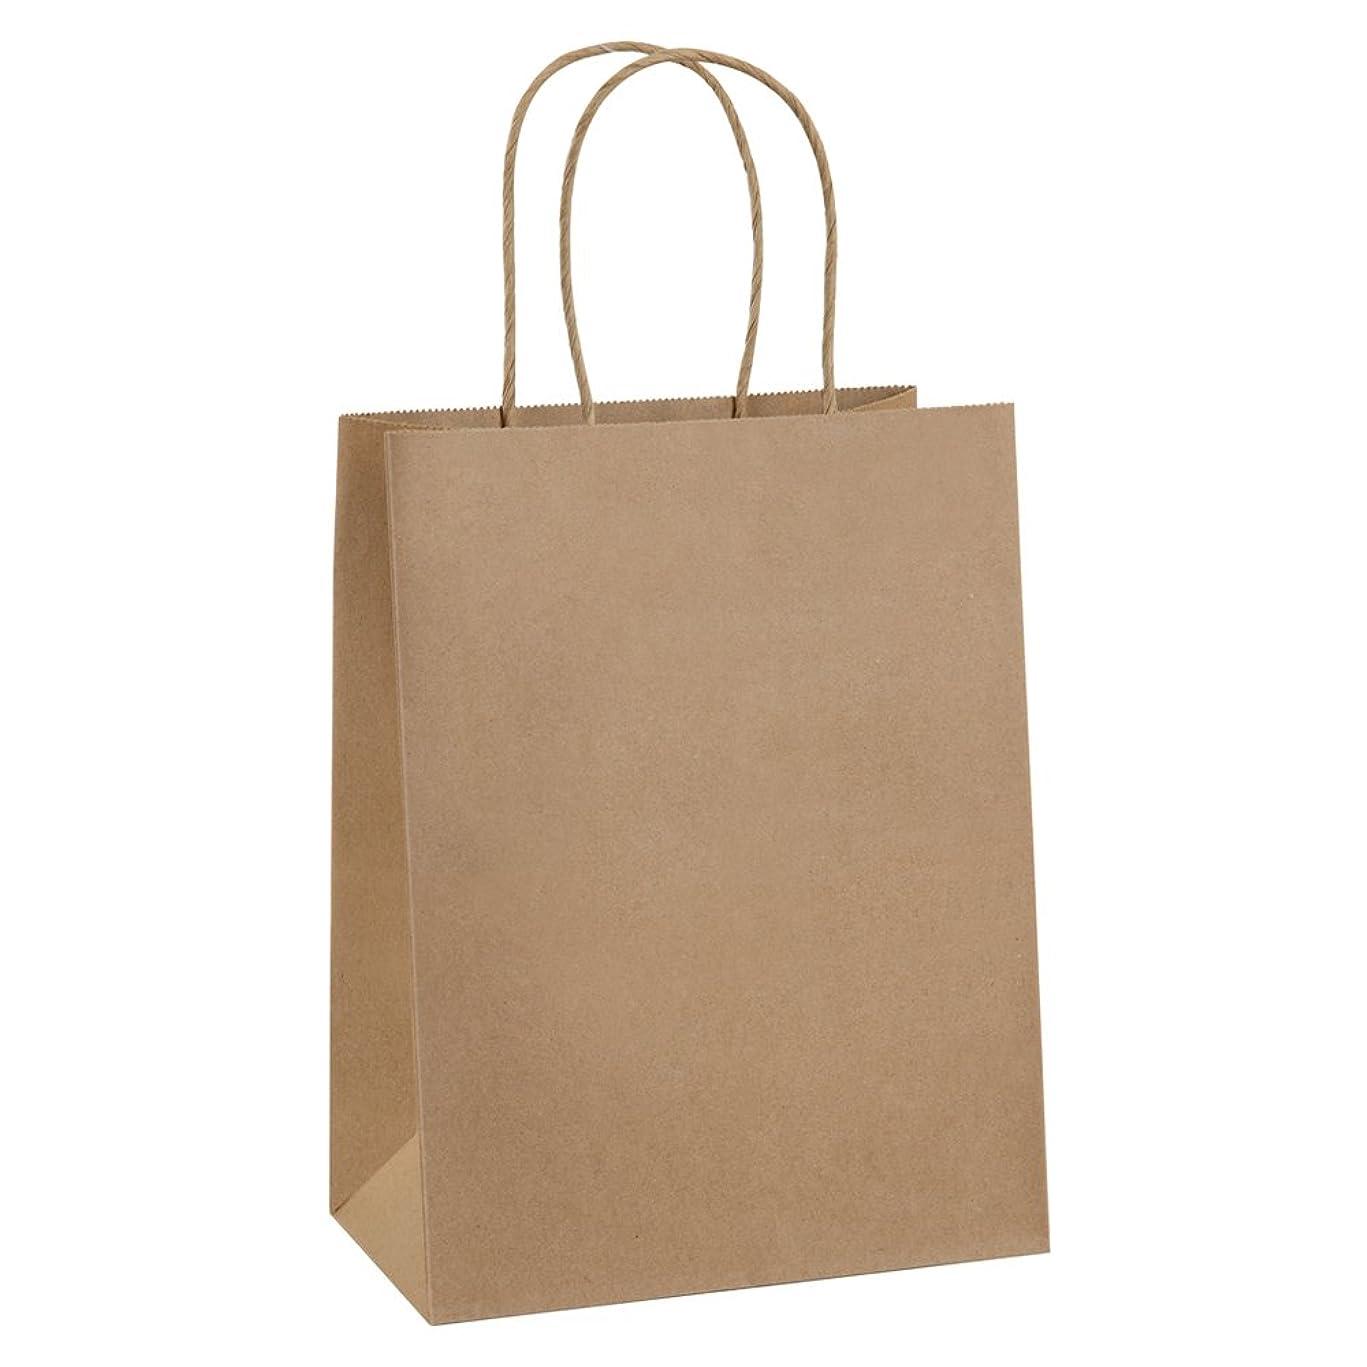 Paper Bags 8x4.75x10.5